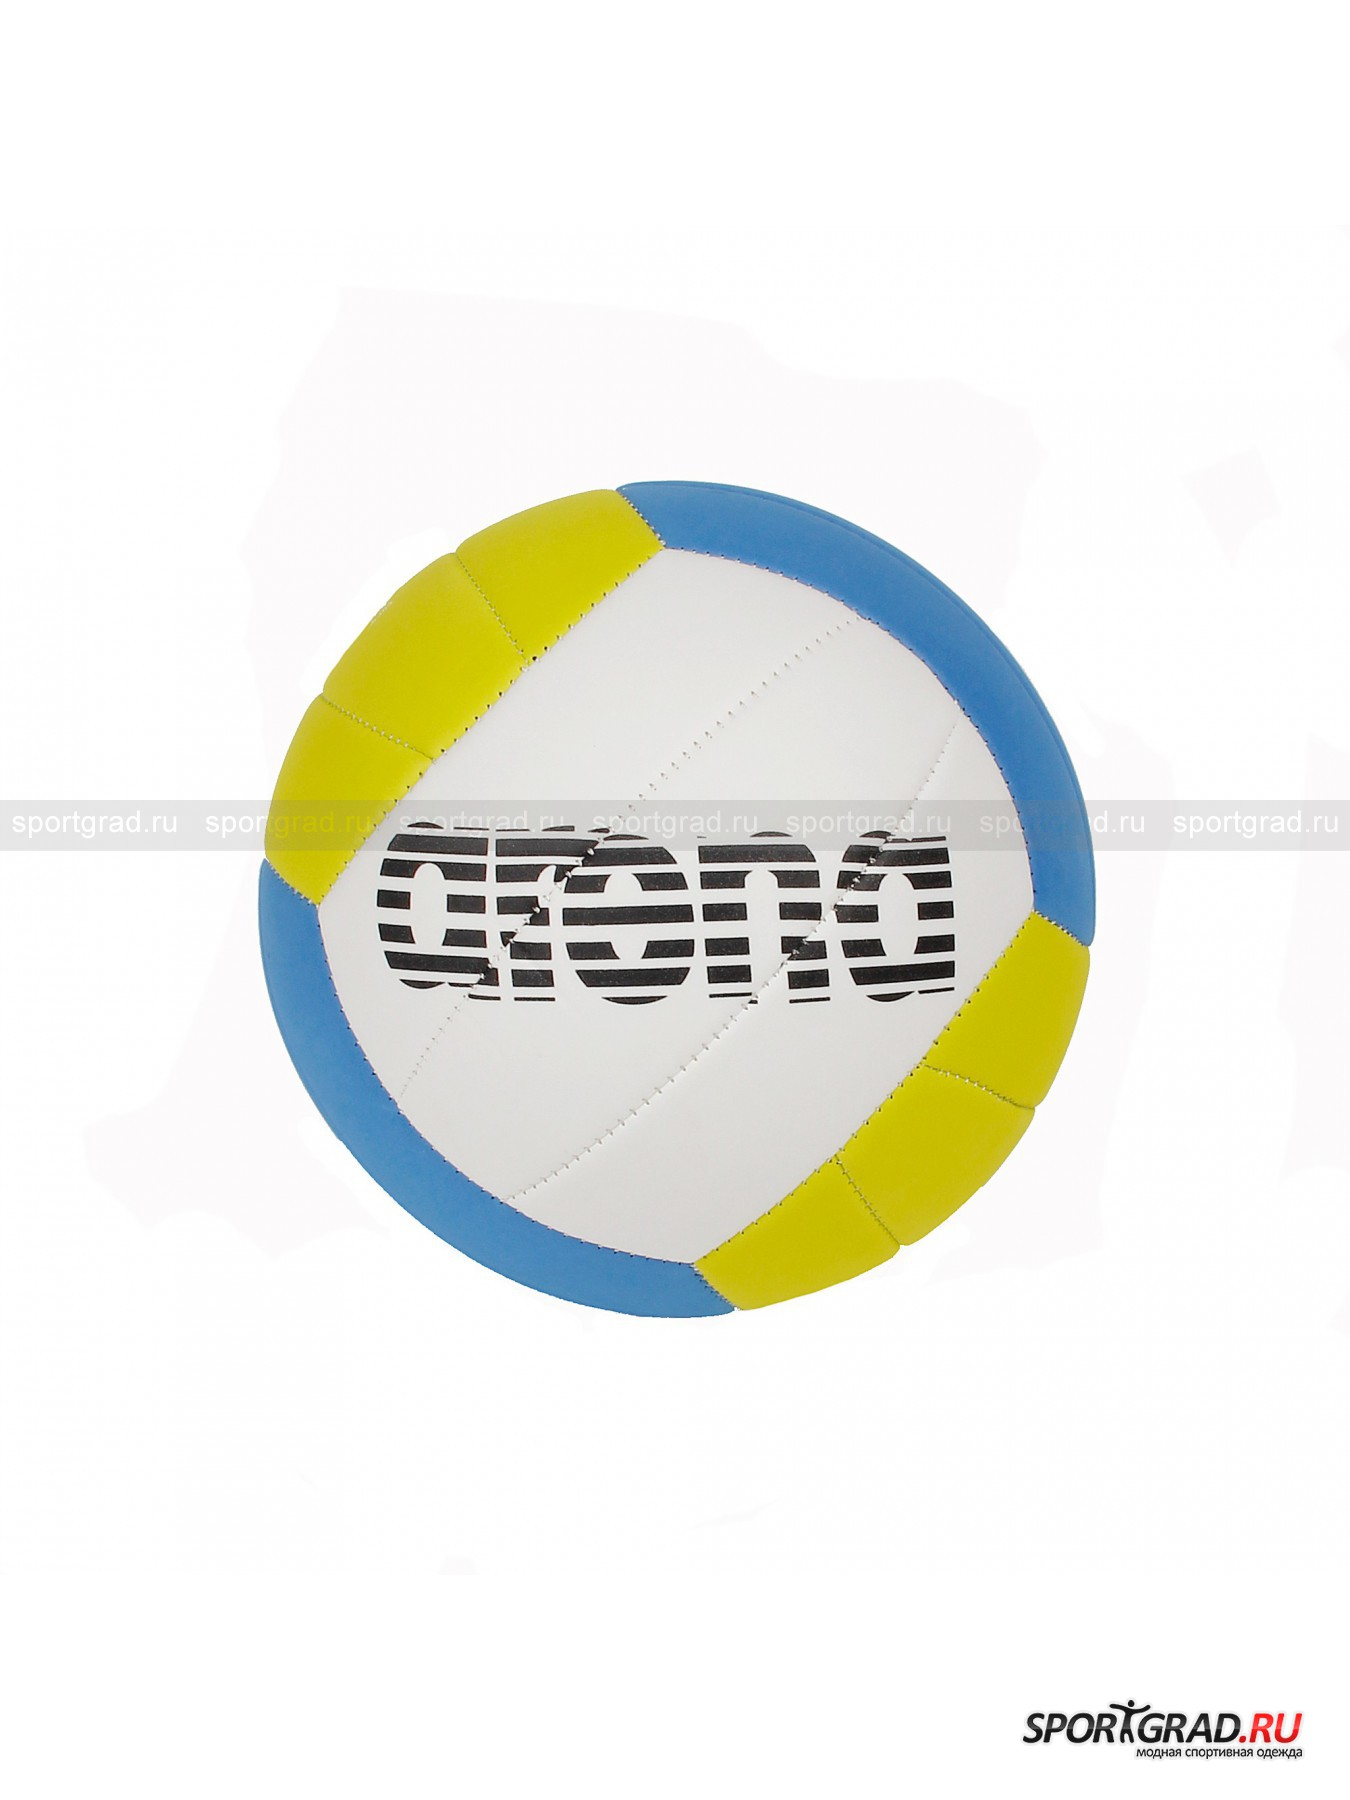 Мяч для волейбола Beach Boll Play ARENA